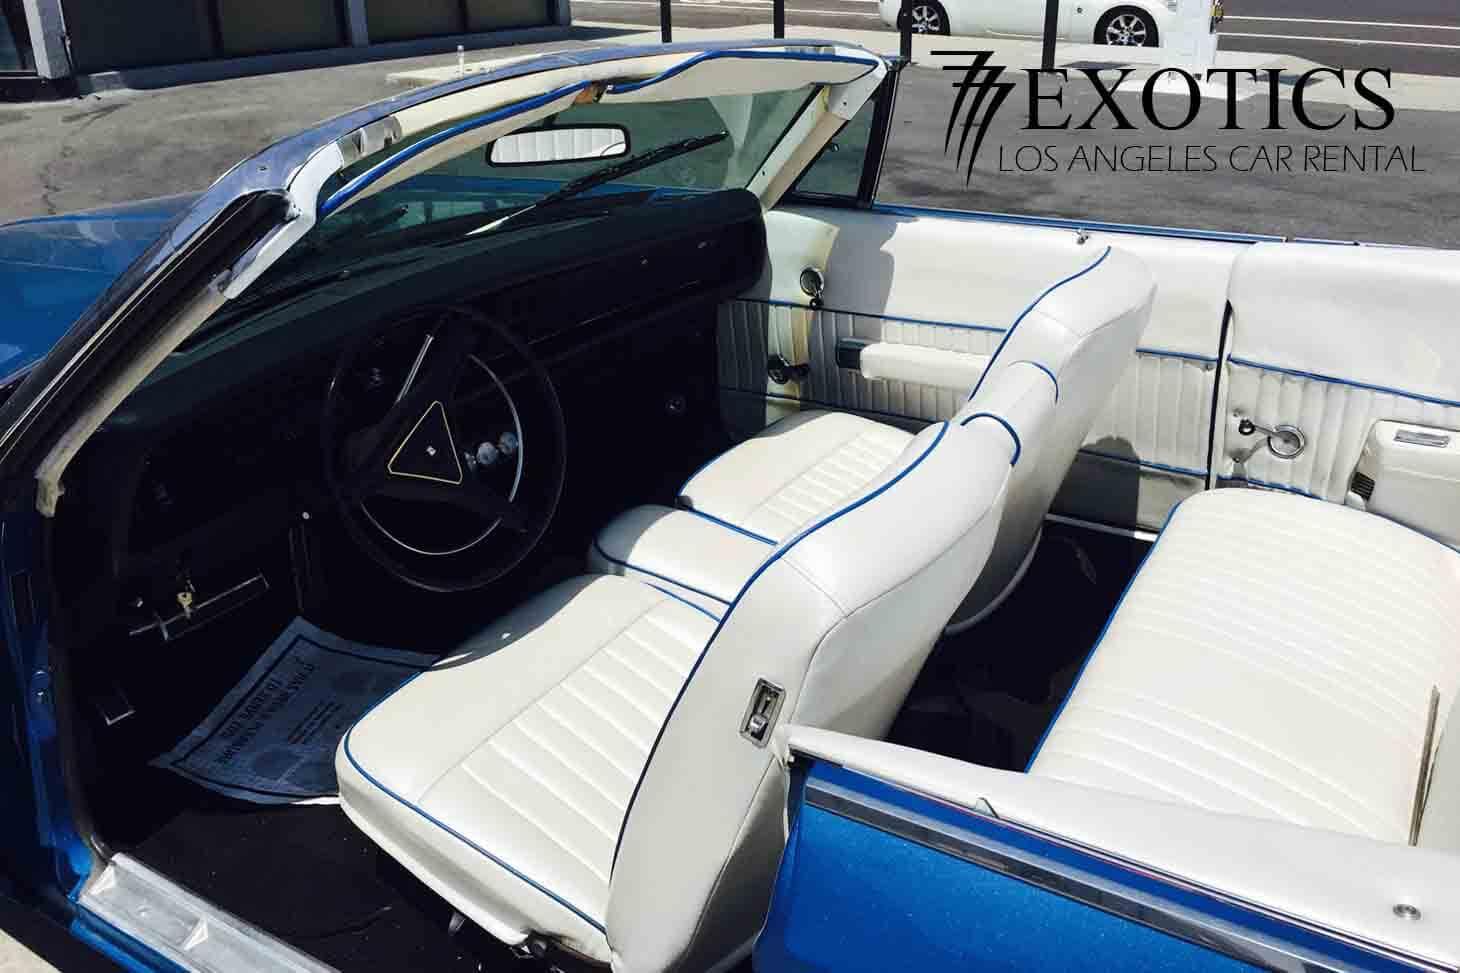 1968 chrysler newport interior 777 exotic car rental los angeles. Black Bedroom Furniture Sets. Home Design Ideas